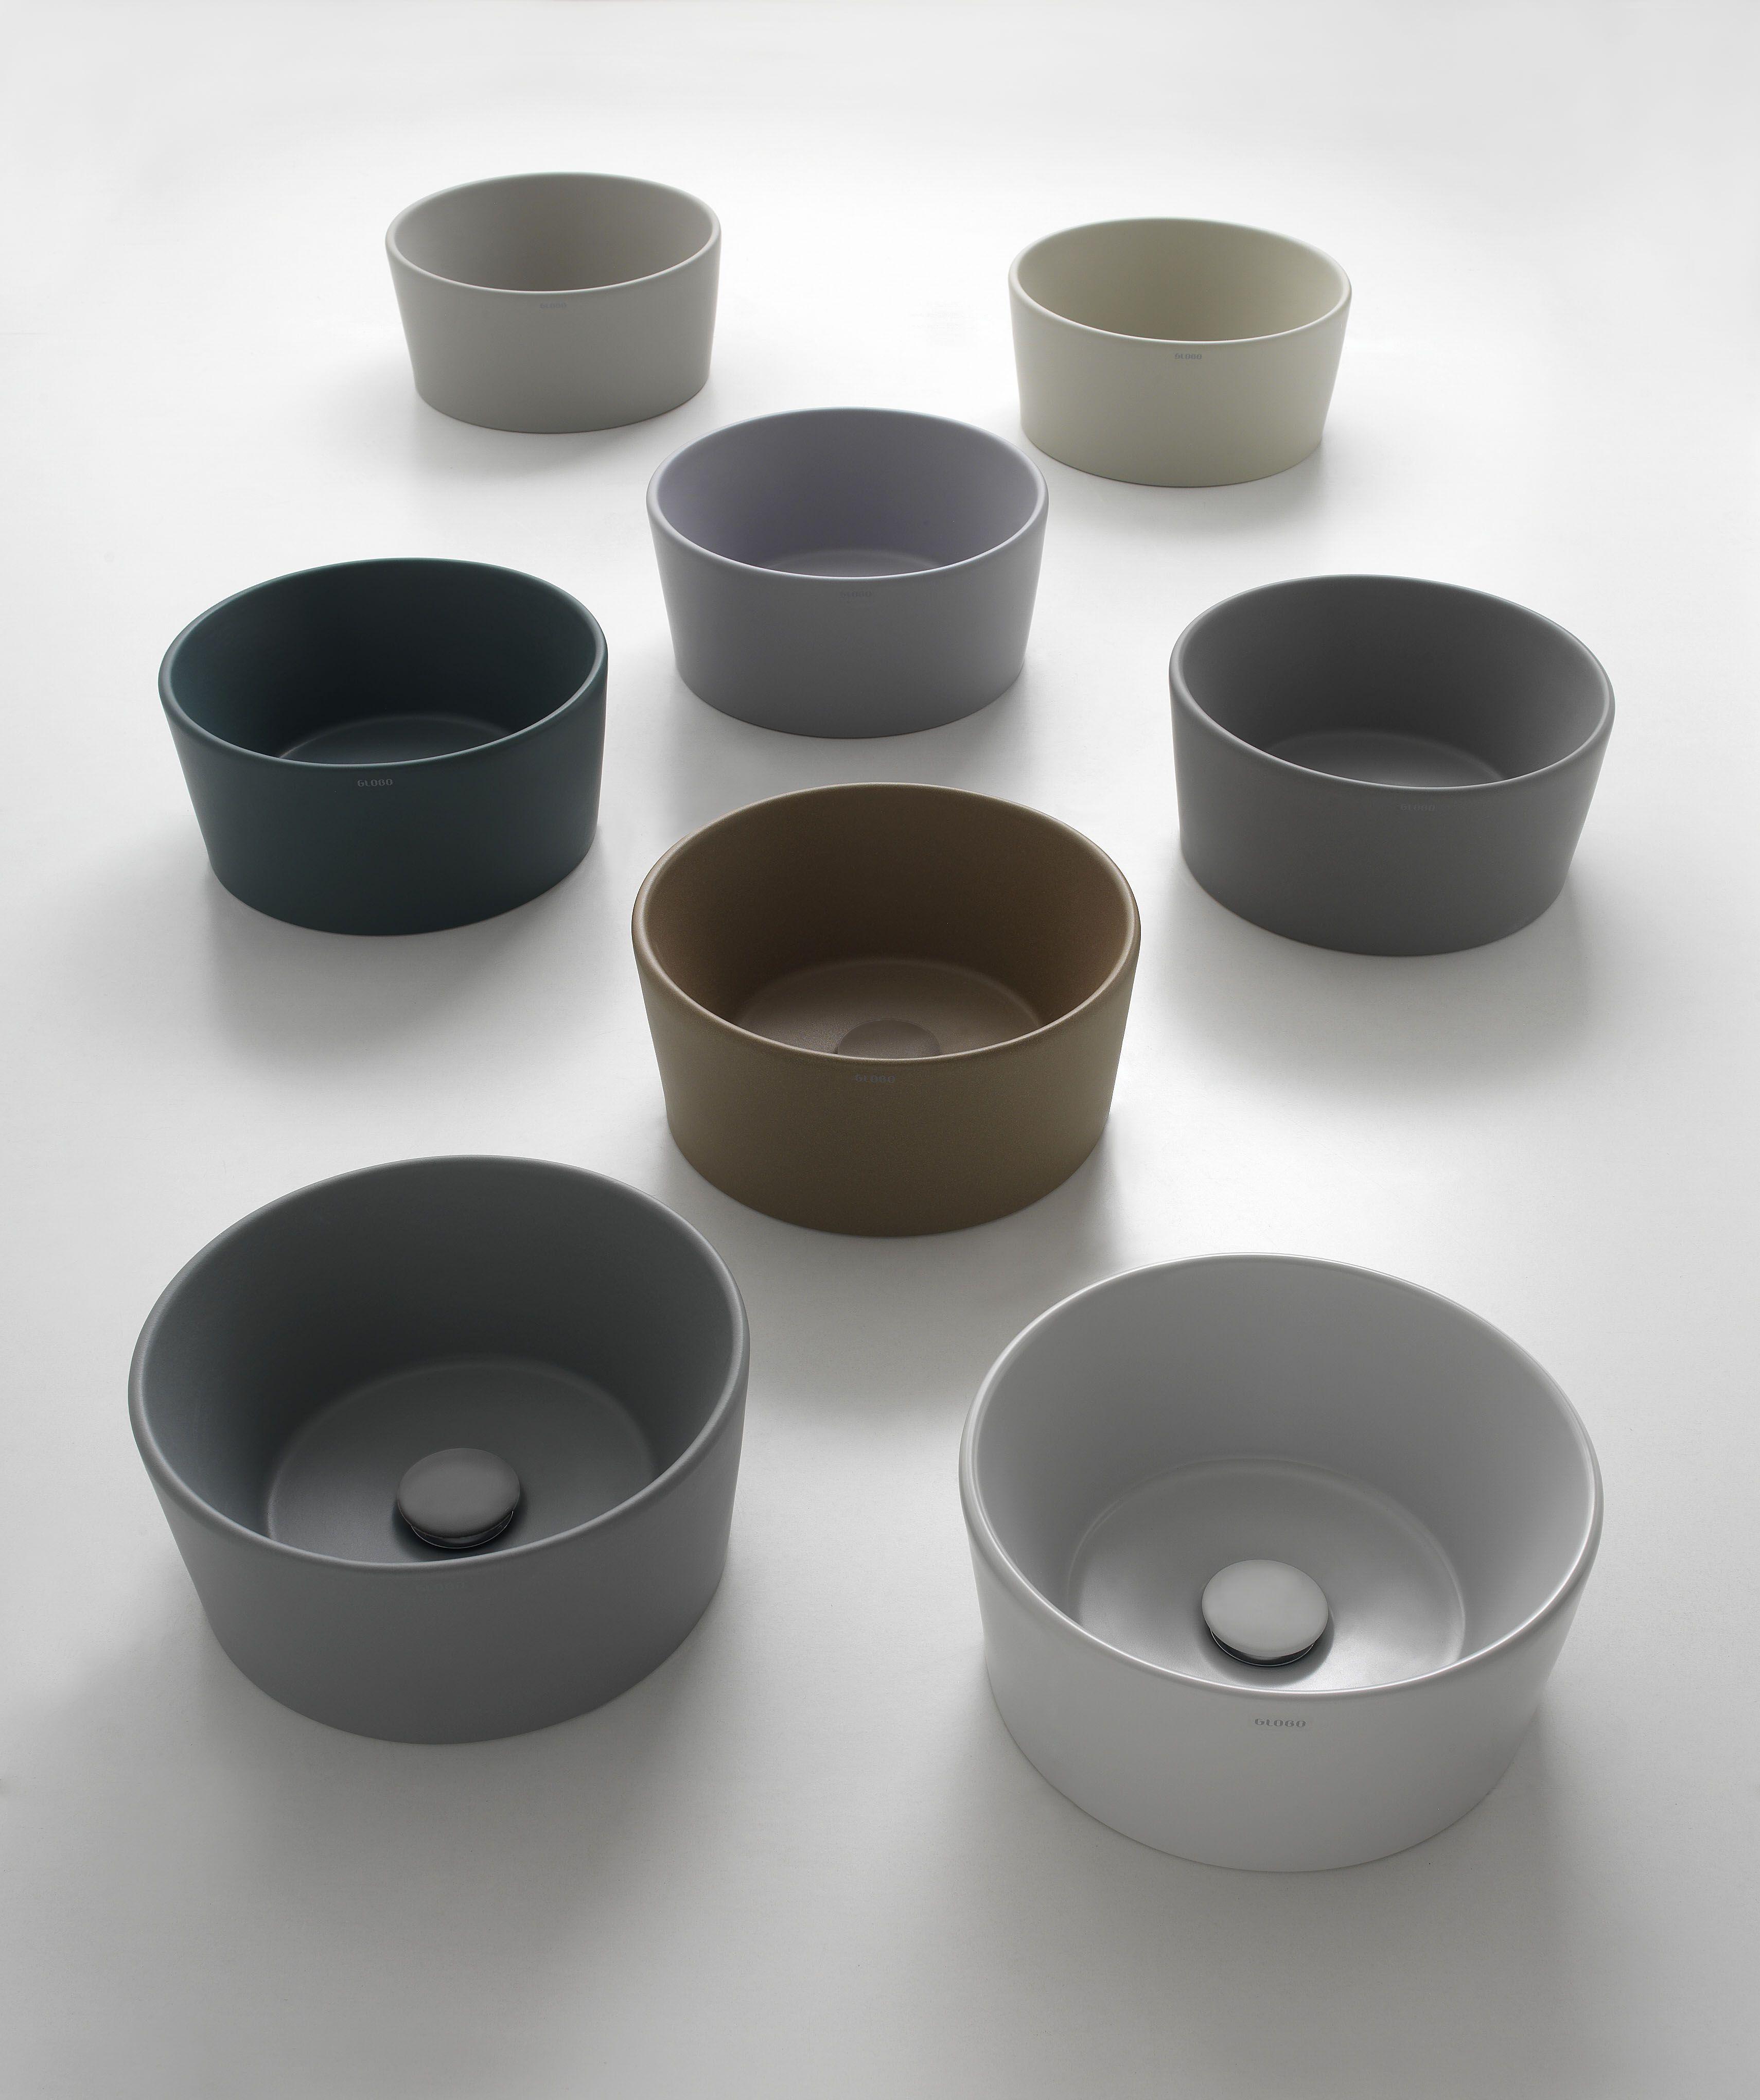 Opzetwastafels van keramiek in verschillende kleuren - Globo via ... - Collezione lavabi Stockholm di Ceramica Globo Leggi l'articolo su  www.designlover.it